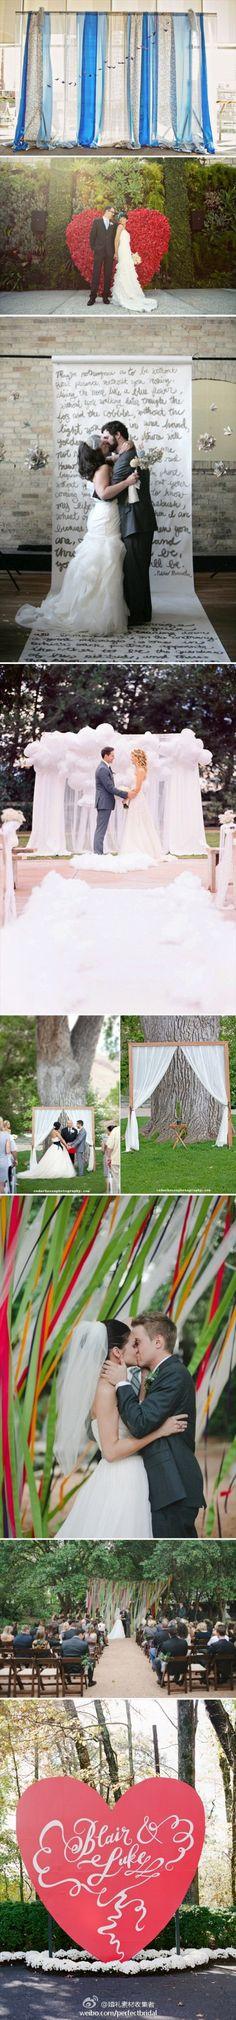 Amazing alternative ceremony backdrops. Do something unique!